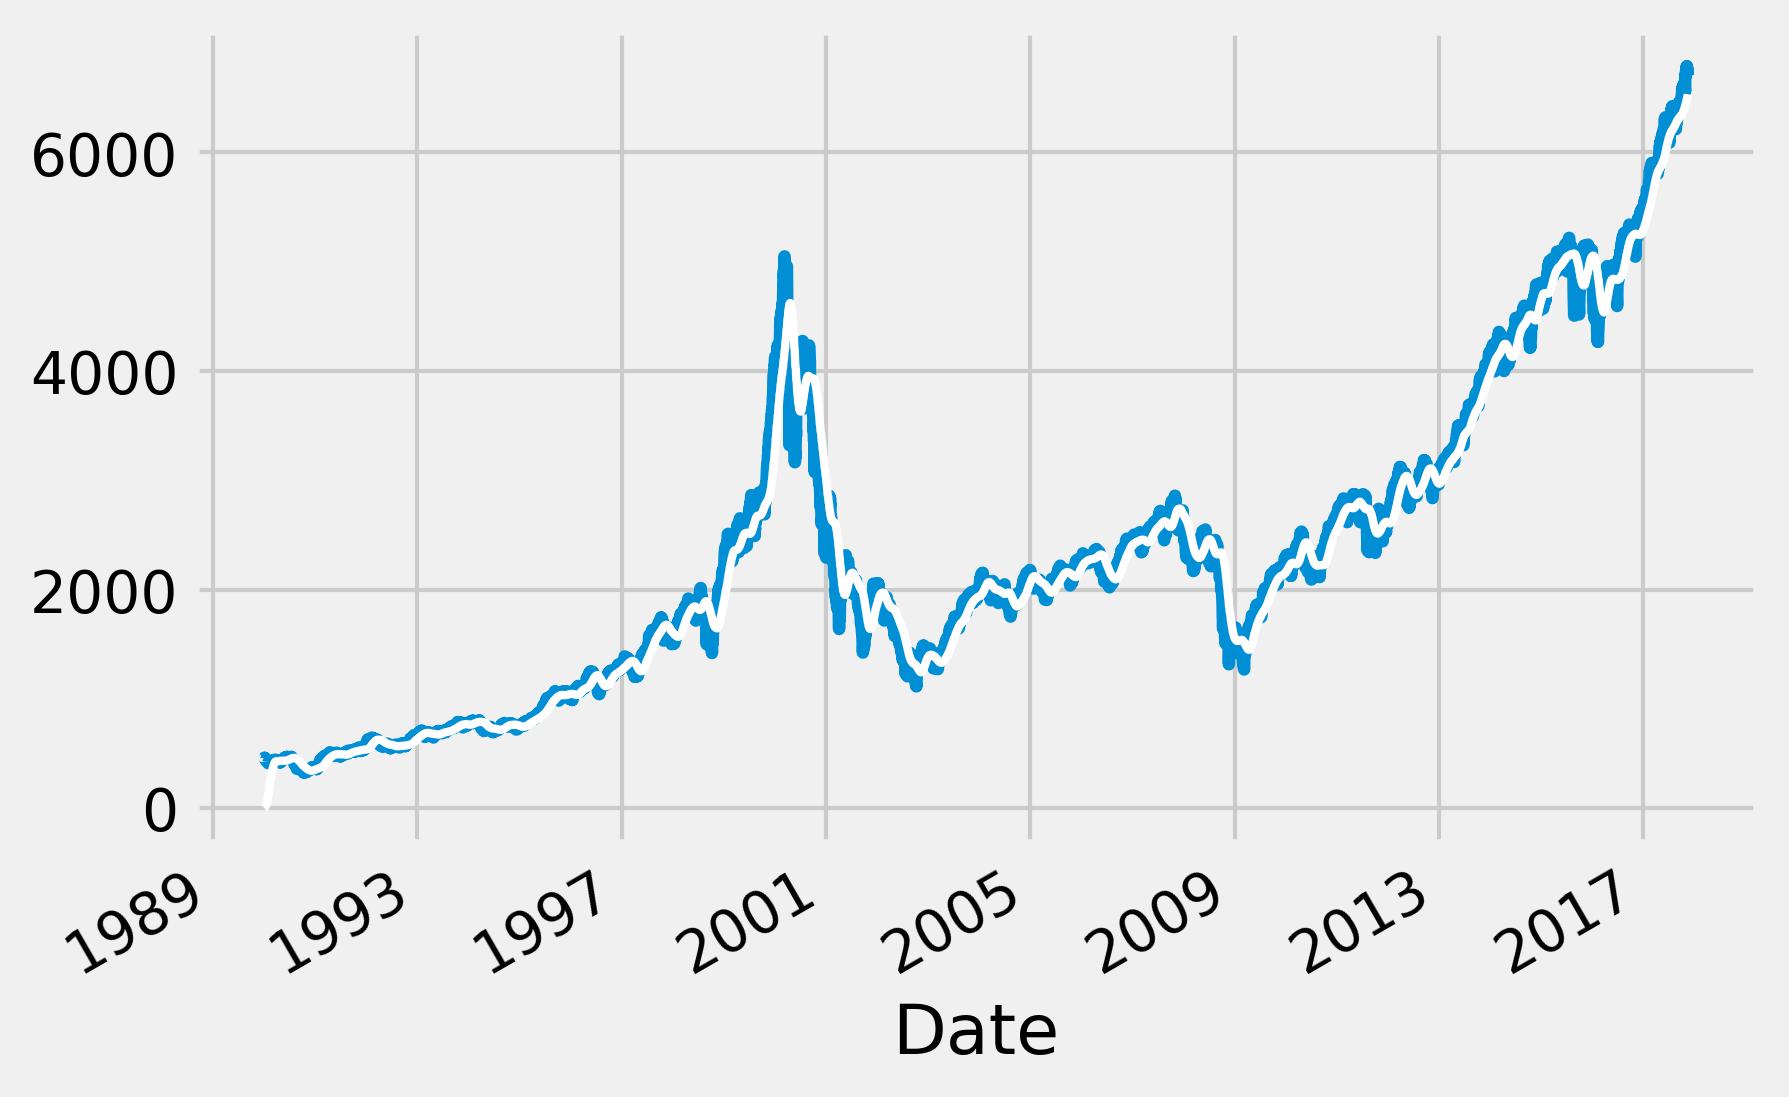 <matplotlib.figure.Figure at 0x1224fe10>